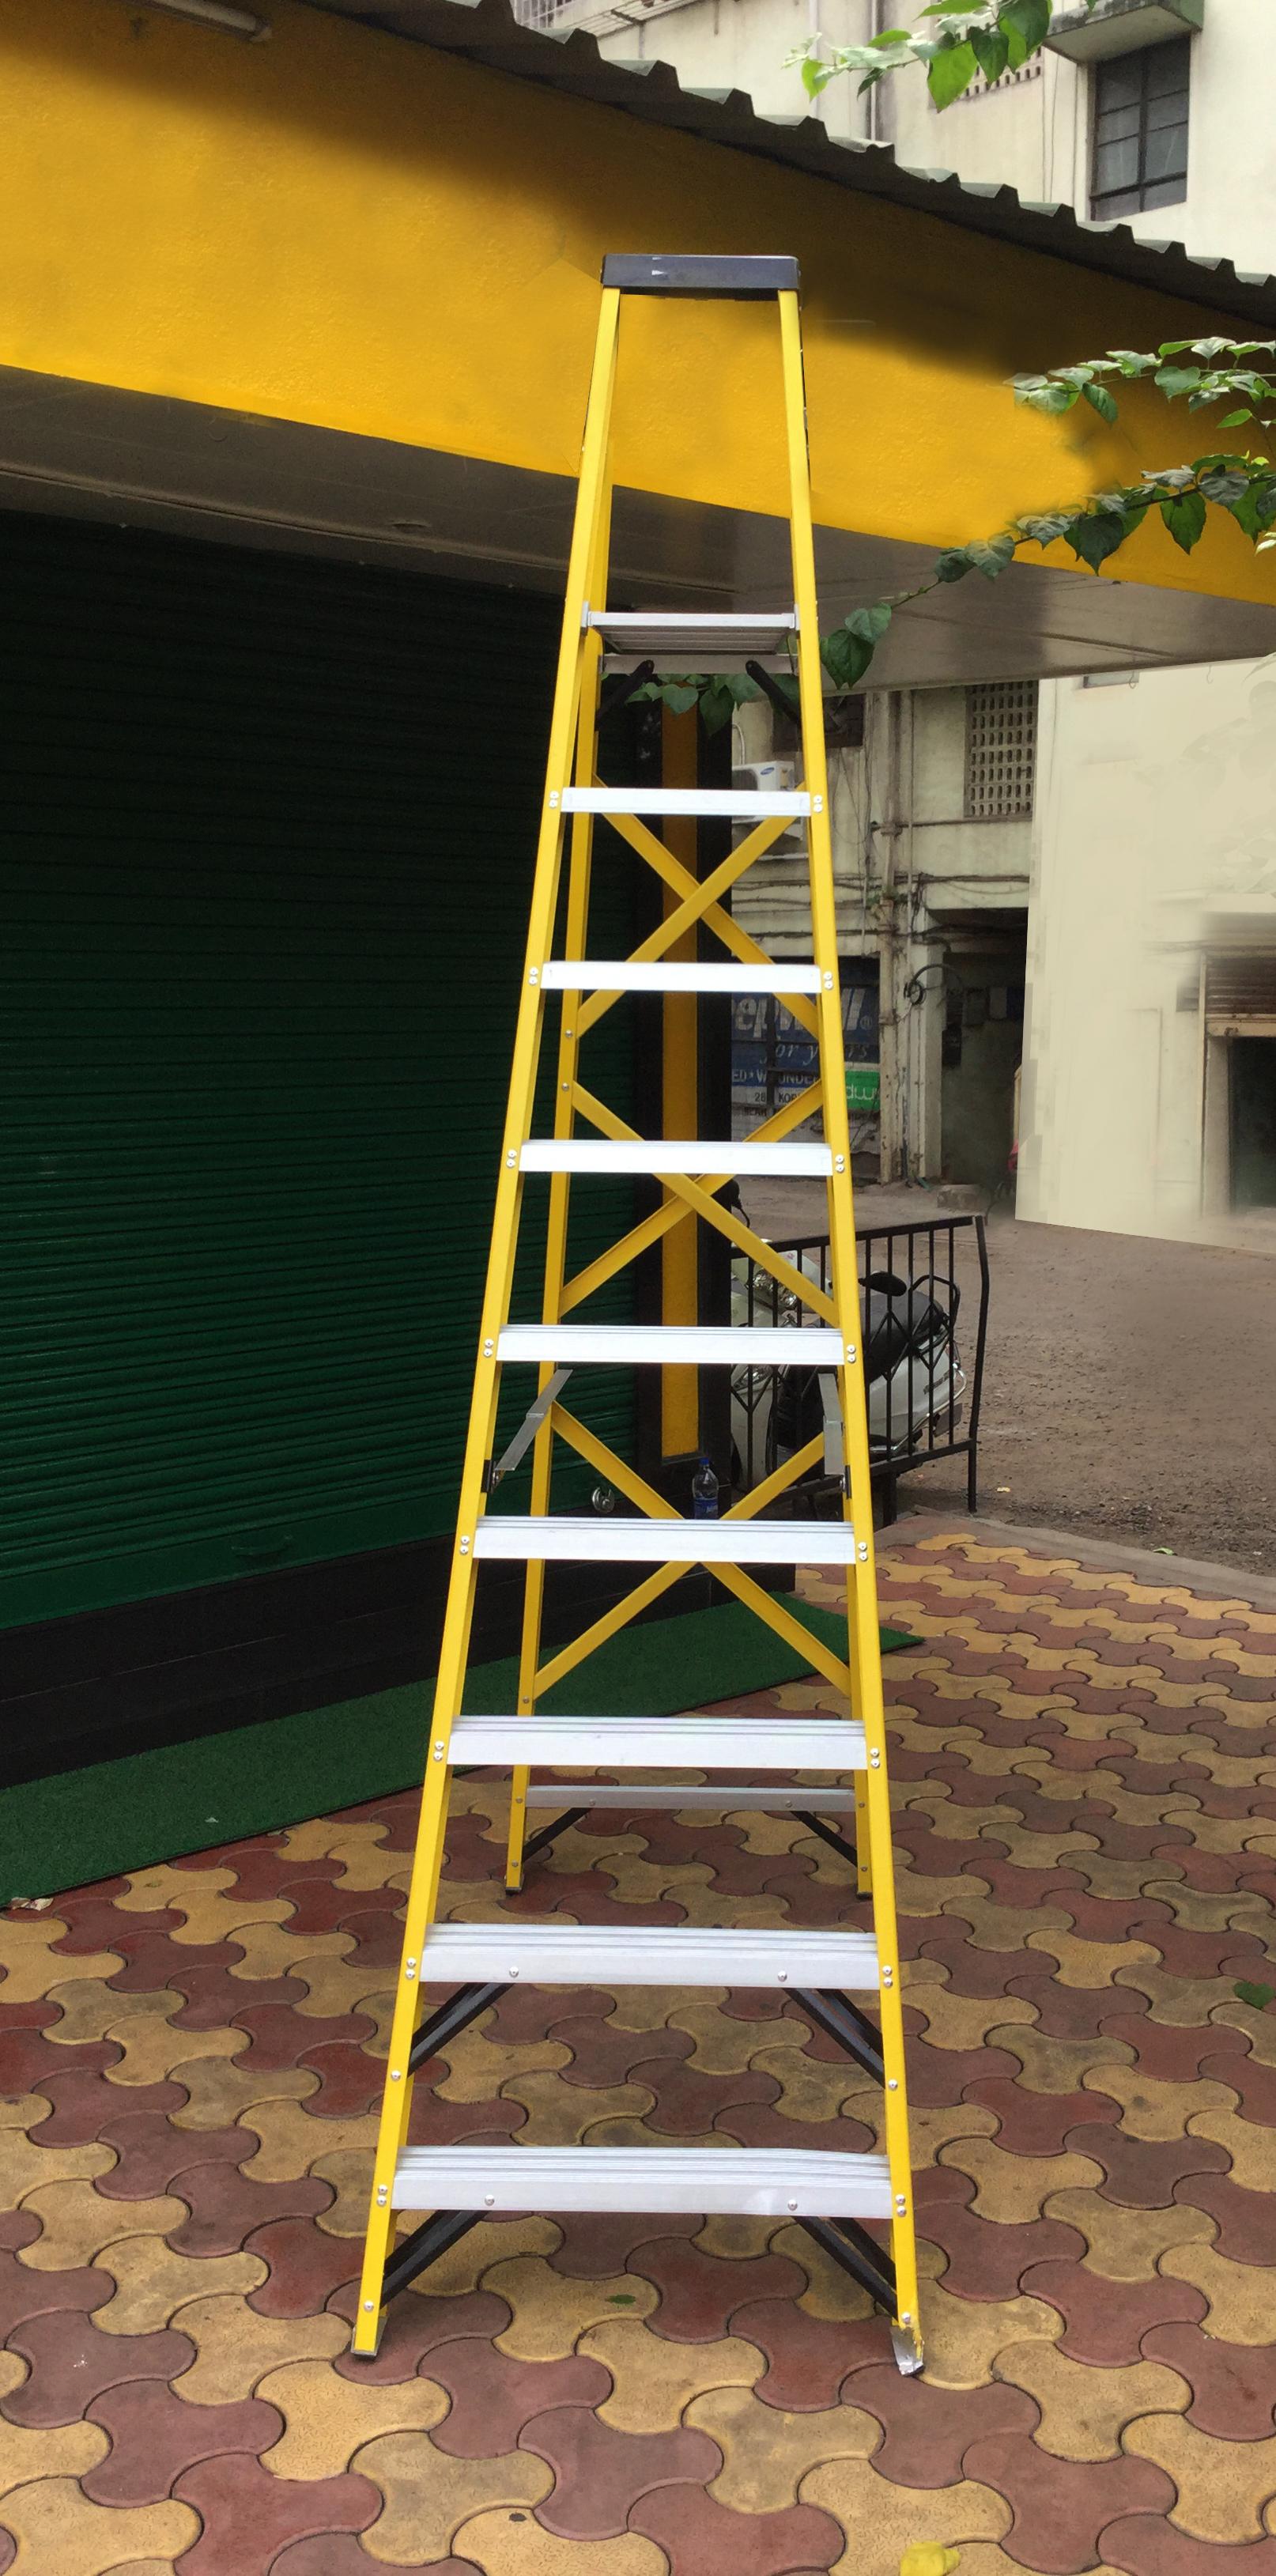 Industrial Step Ladders With Platform In The Range - 6ft to 14ft (Reinforced Back Frame)